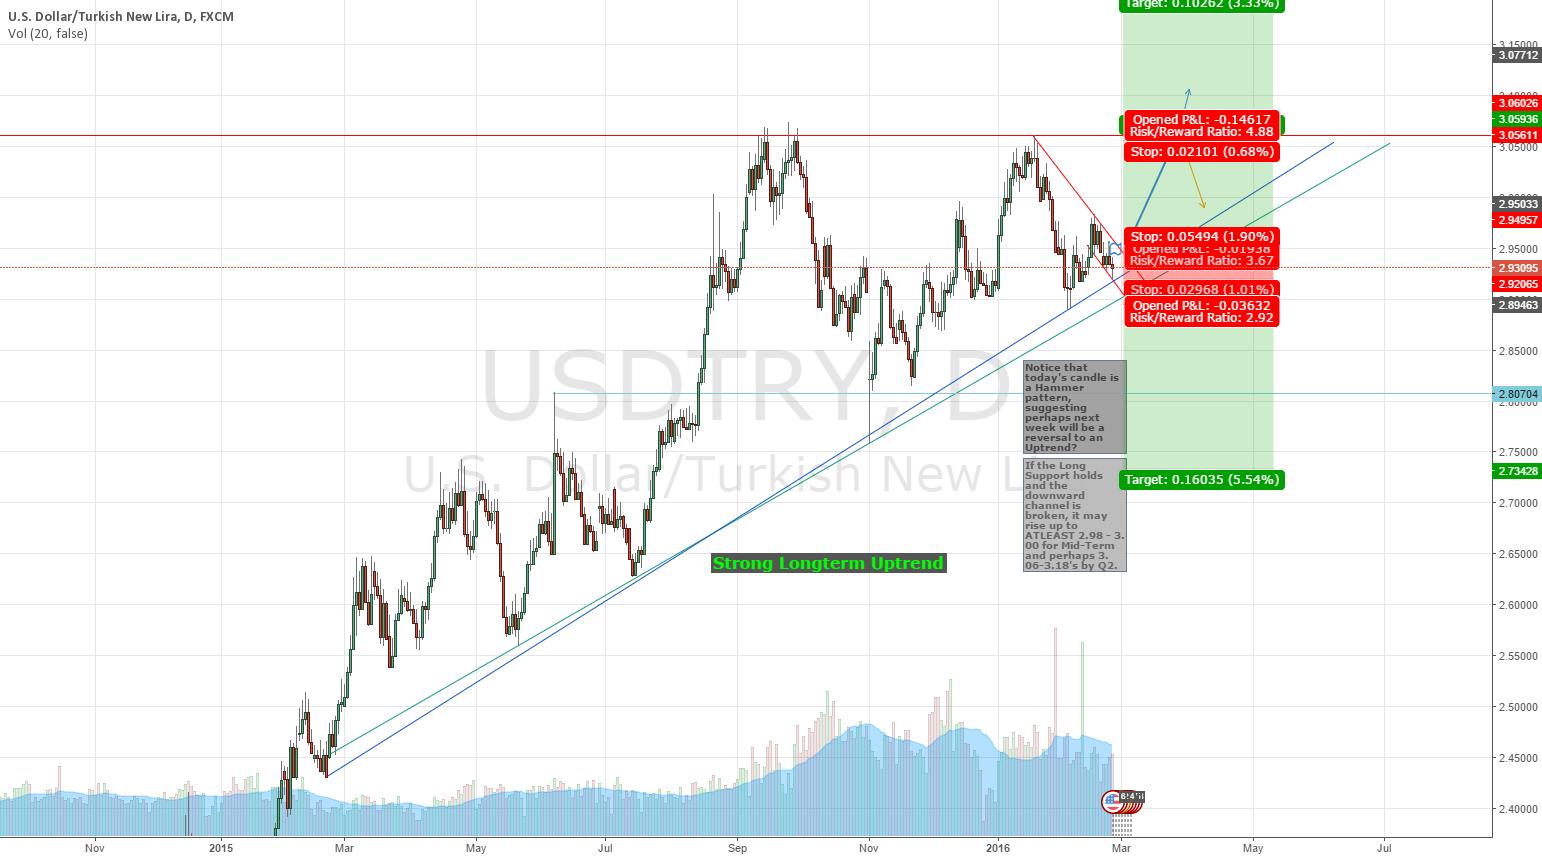 USDTRY Hitting Support? Reversal Pattern for next week?